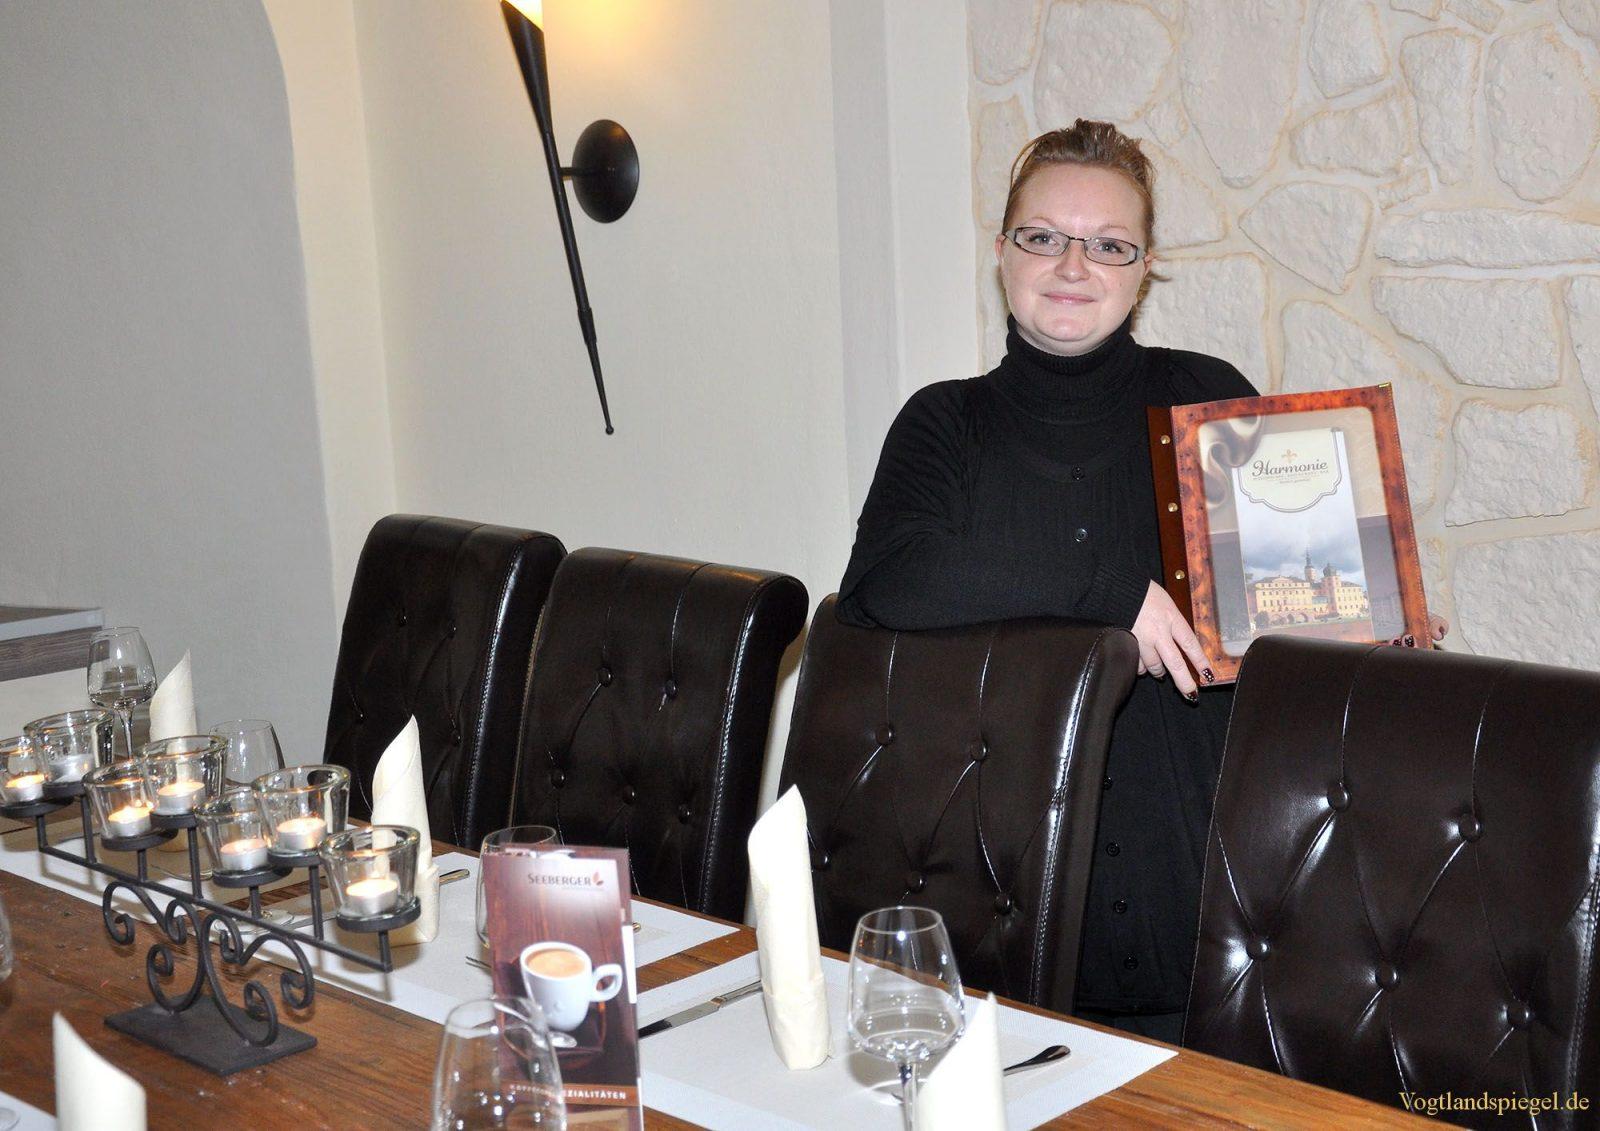 Harmonie Schlosscafé-Restaurant – Bar im Greizer Unteren Schloss eröffnet